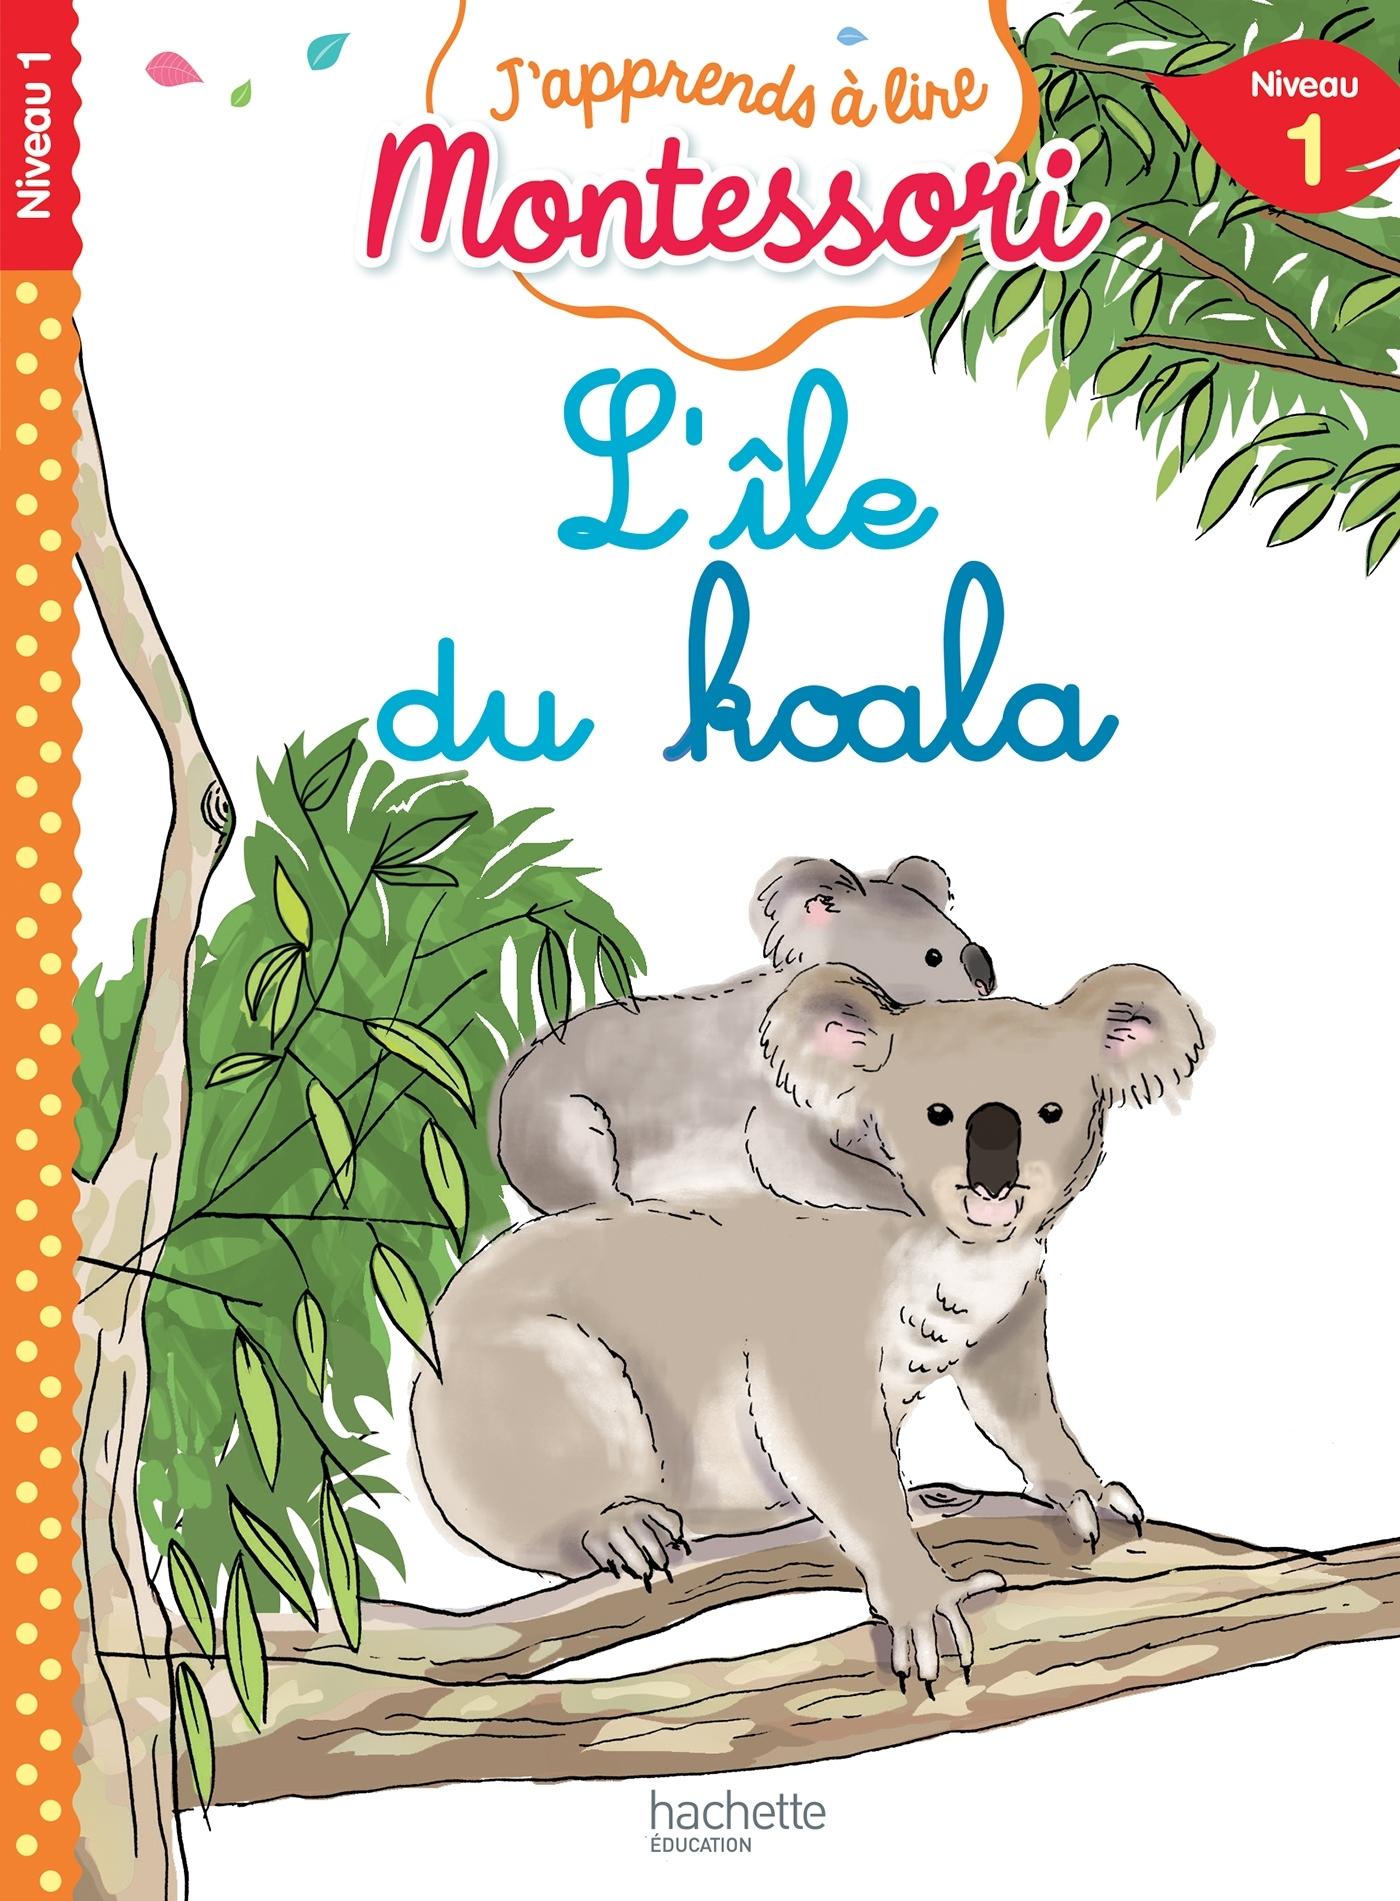 L'ILE DU KOALA, NIVEAU 1 - J'APPRENDS A LIRE MONTESSORI